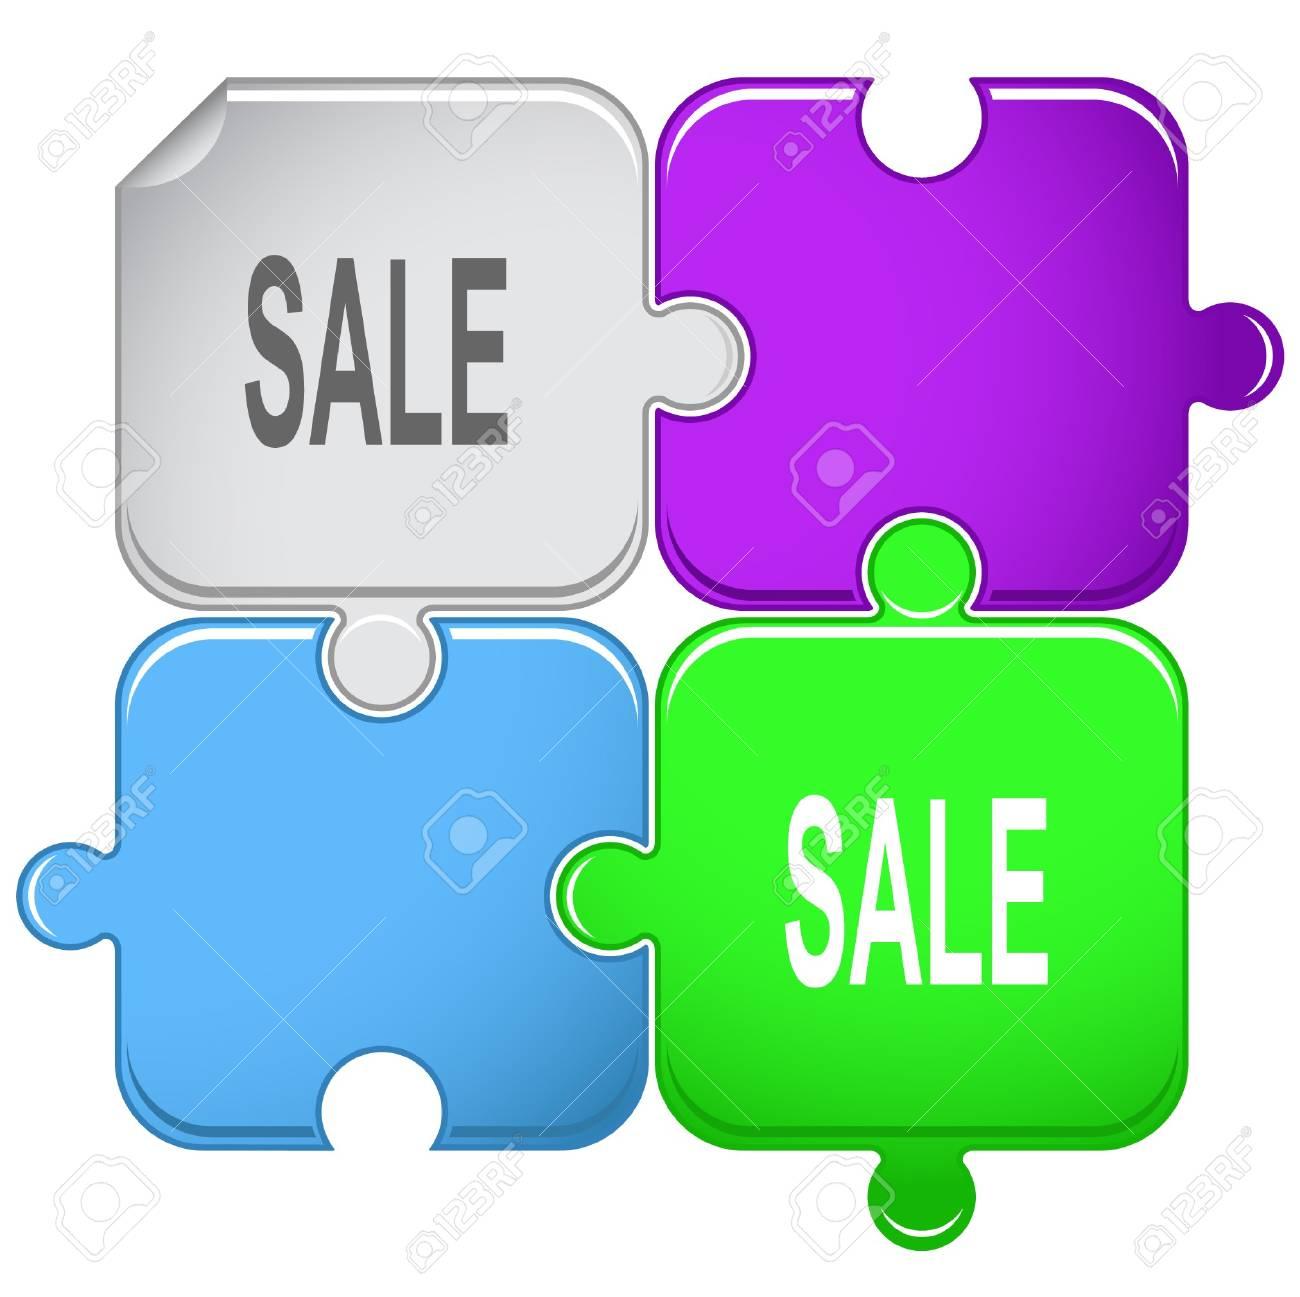 Sale. puzzle. Stock Vector - 6862217